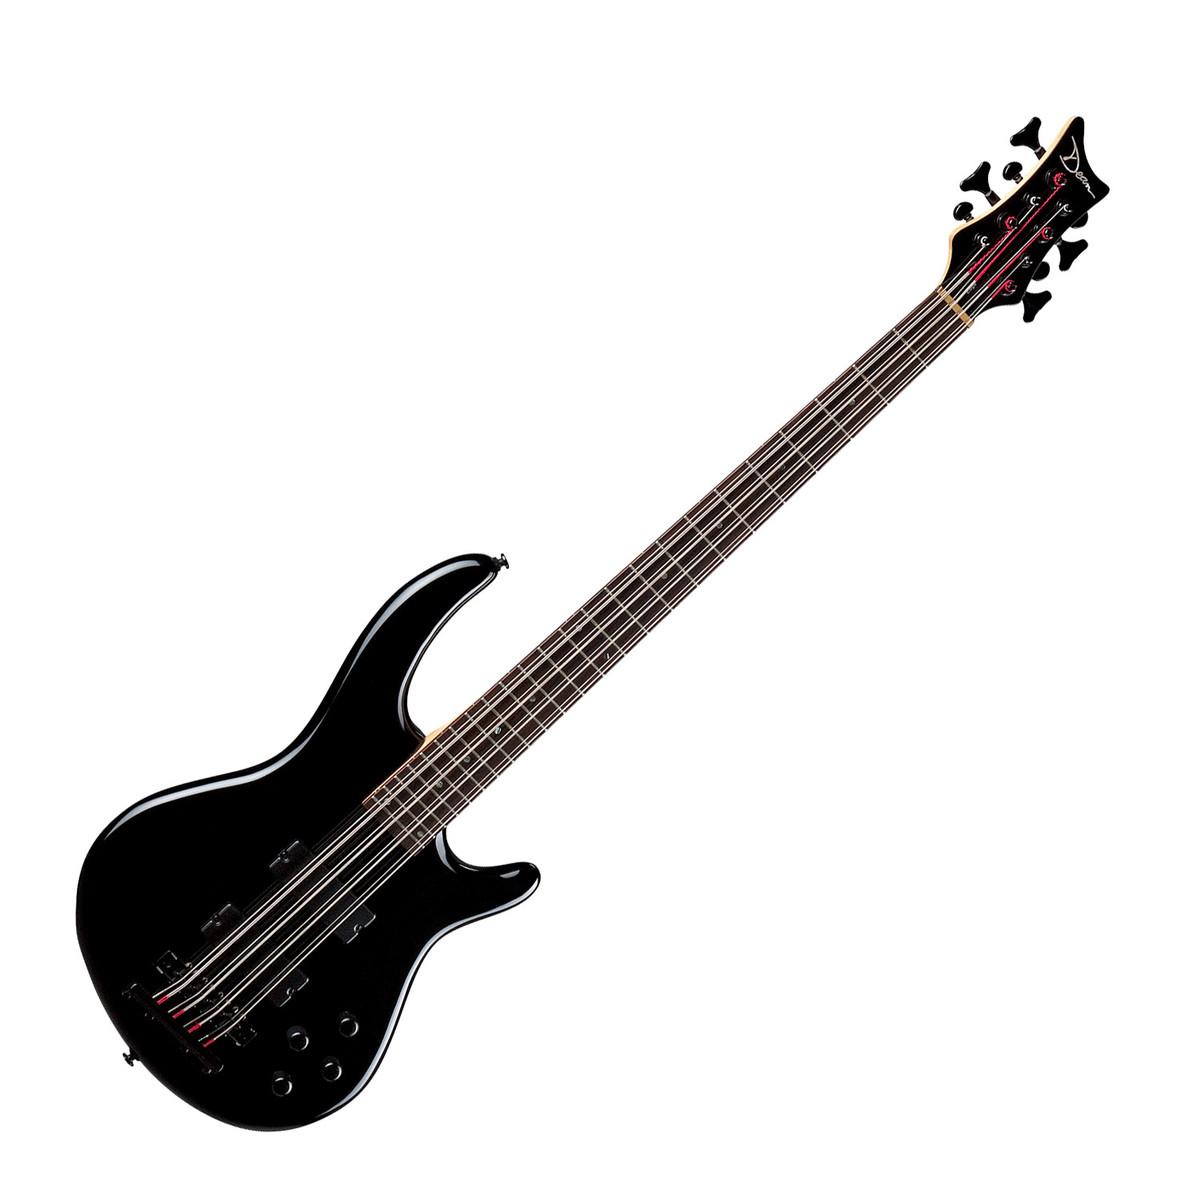 dean edge active eq 8 string bass guitar classic black at. Black Bedroom Furniture Sets. Home Design Ideas